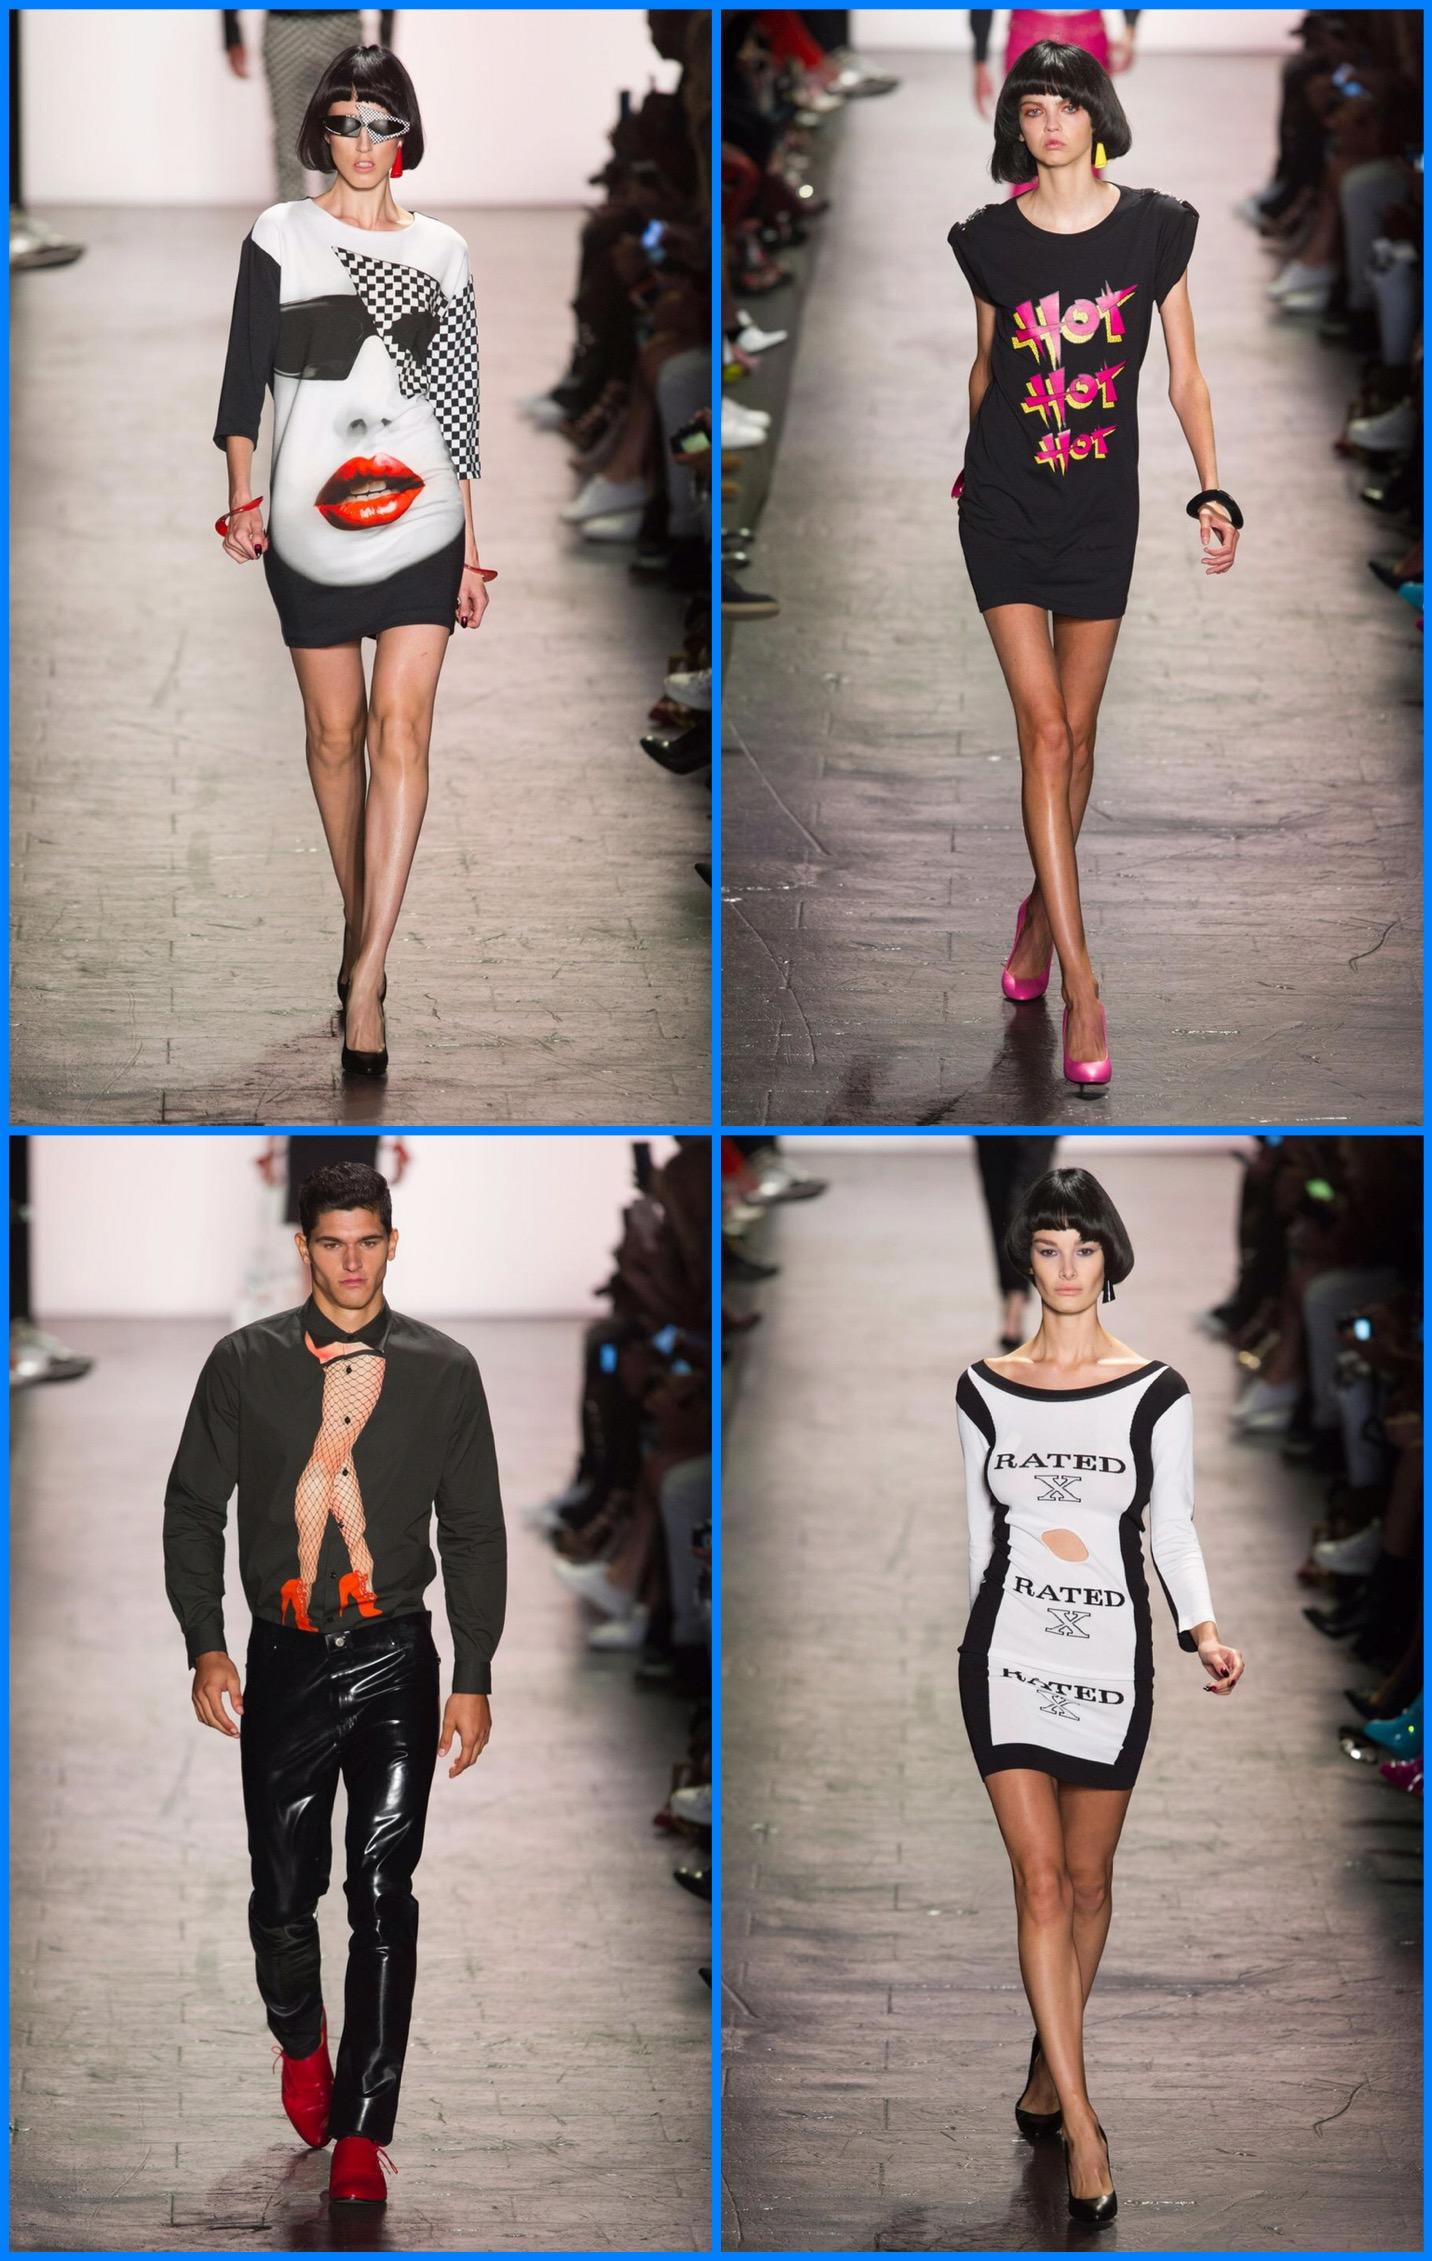 new-york-fashion-week-pret-a-porter-spring-summer-2017-style-jeremy-scott